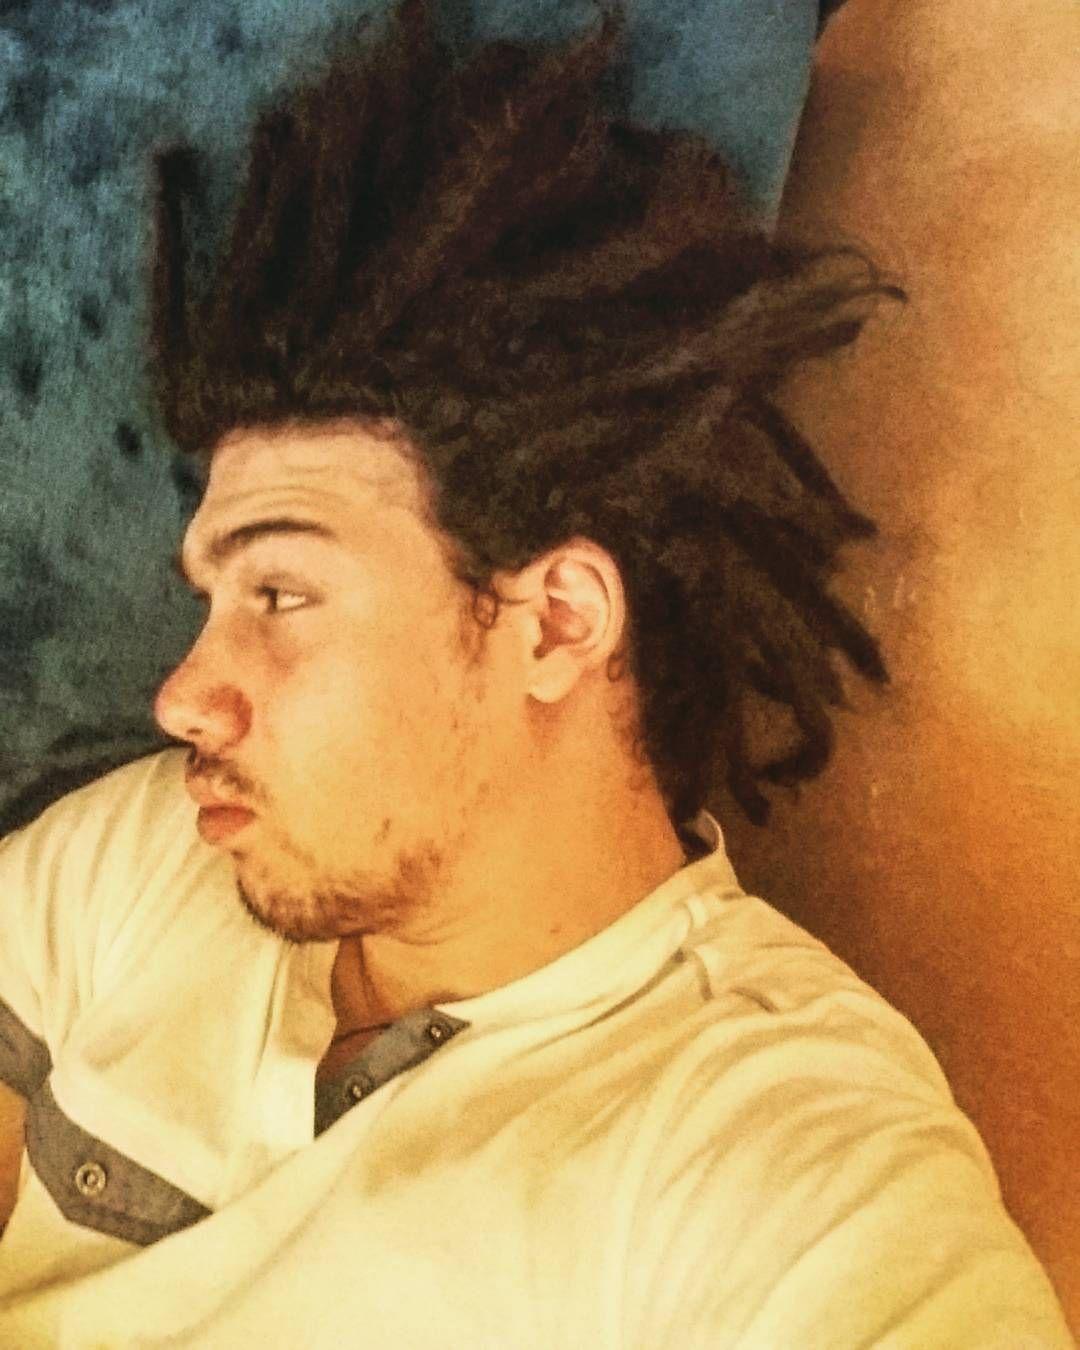 Rastafari Rastaman Rastafa Rasta Reggae Bobmarley Marley - Ethiopian hipster hairstyle